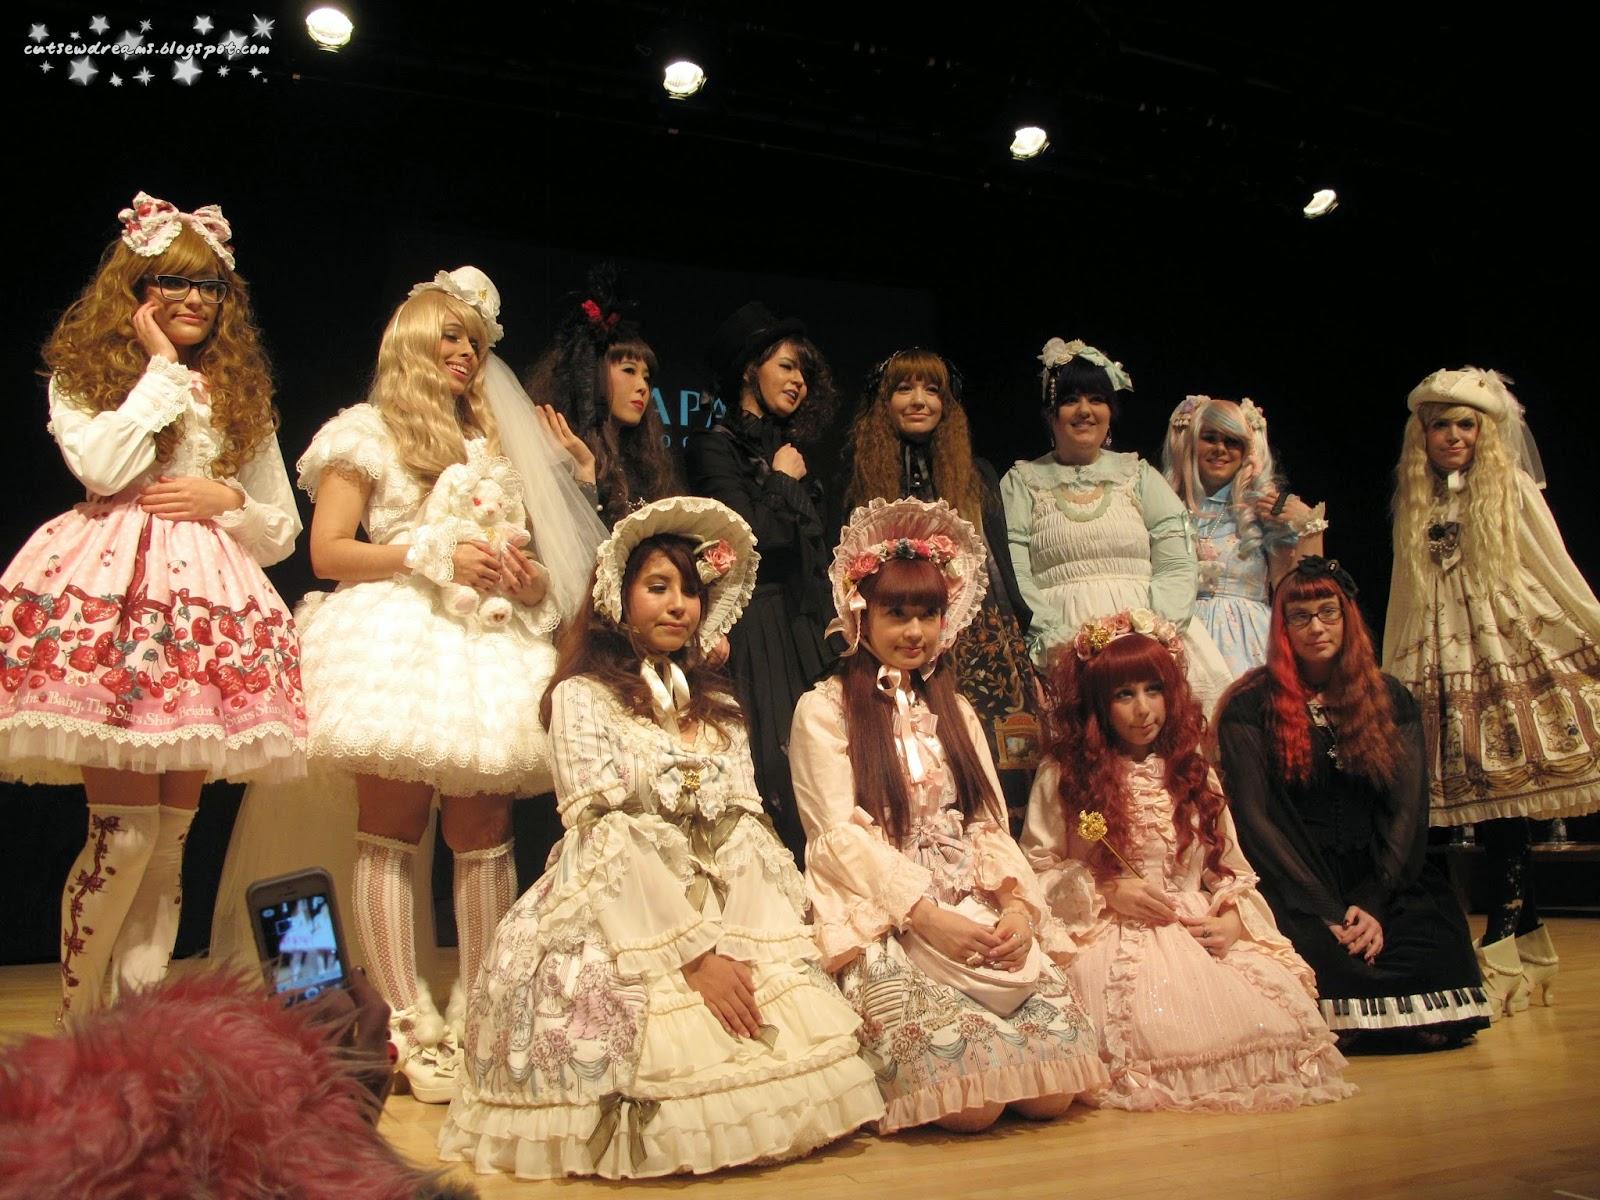 misako aoki,aoki misako,misakoaoki,aokimisako,japan society,japan,society,lecture,lolita lecture,lolita,lolita fashion.fasion,japanese street fashion,street fashion,btssb,ap,baby the stars shine bright,babythestarsshinebright,angelic pretty,angelicpretty, fantastic dolly, memorial cake,jsk,lolita model,fashion show,lolita fashion show,japanese culture,culture,